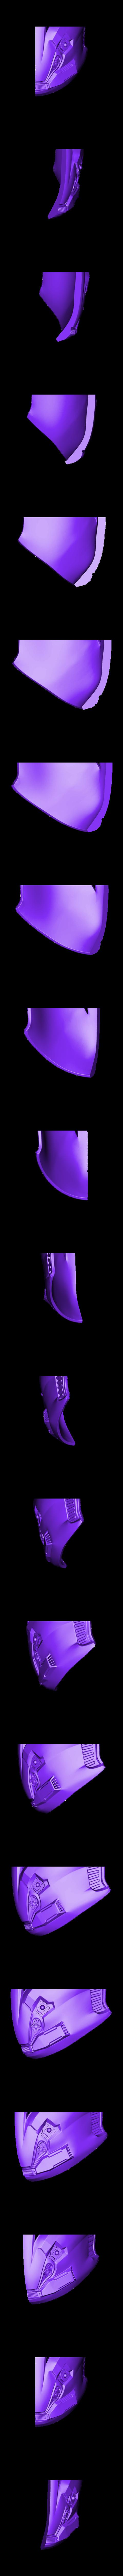 Part_4.stl Download free STL file Arcann Mask Star Wars • 3D print template, VillainousPropShop